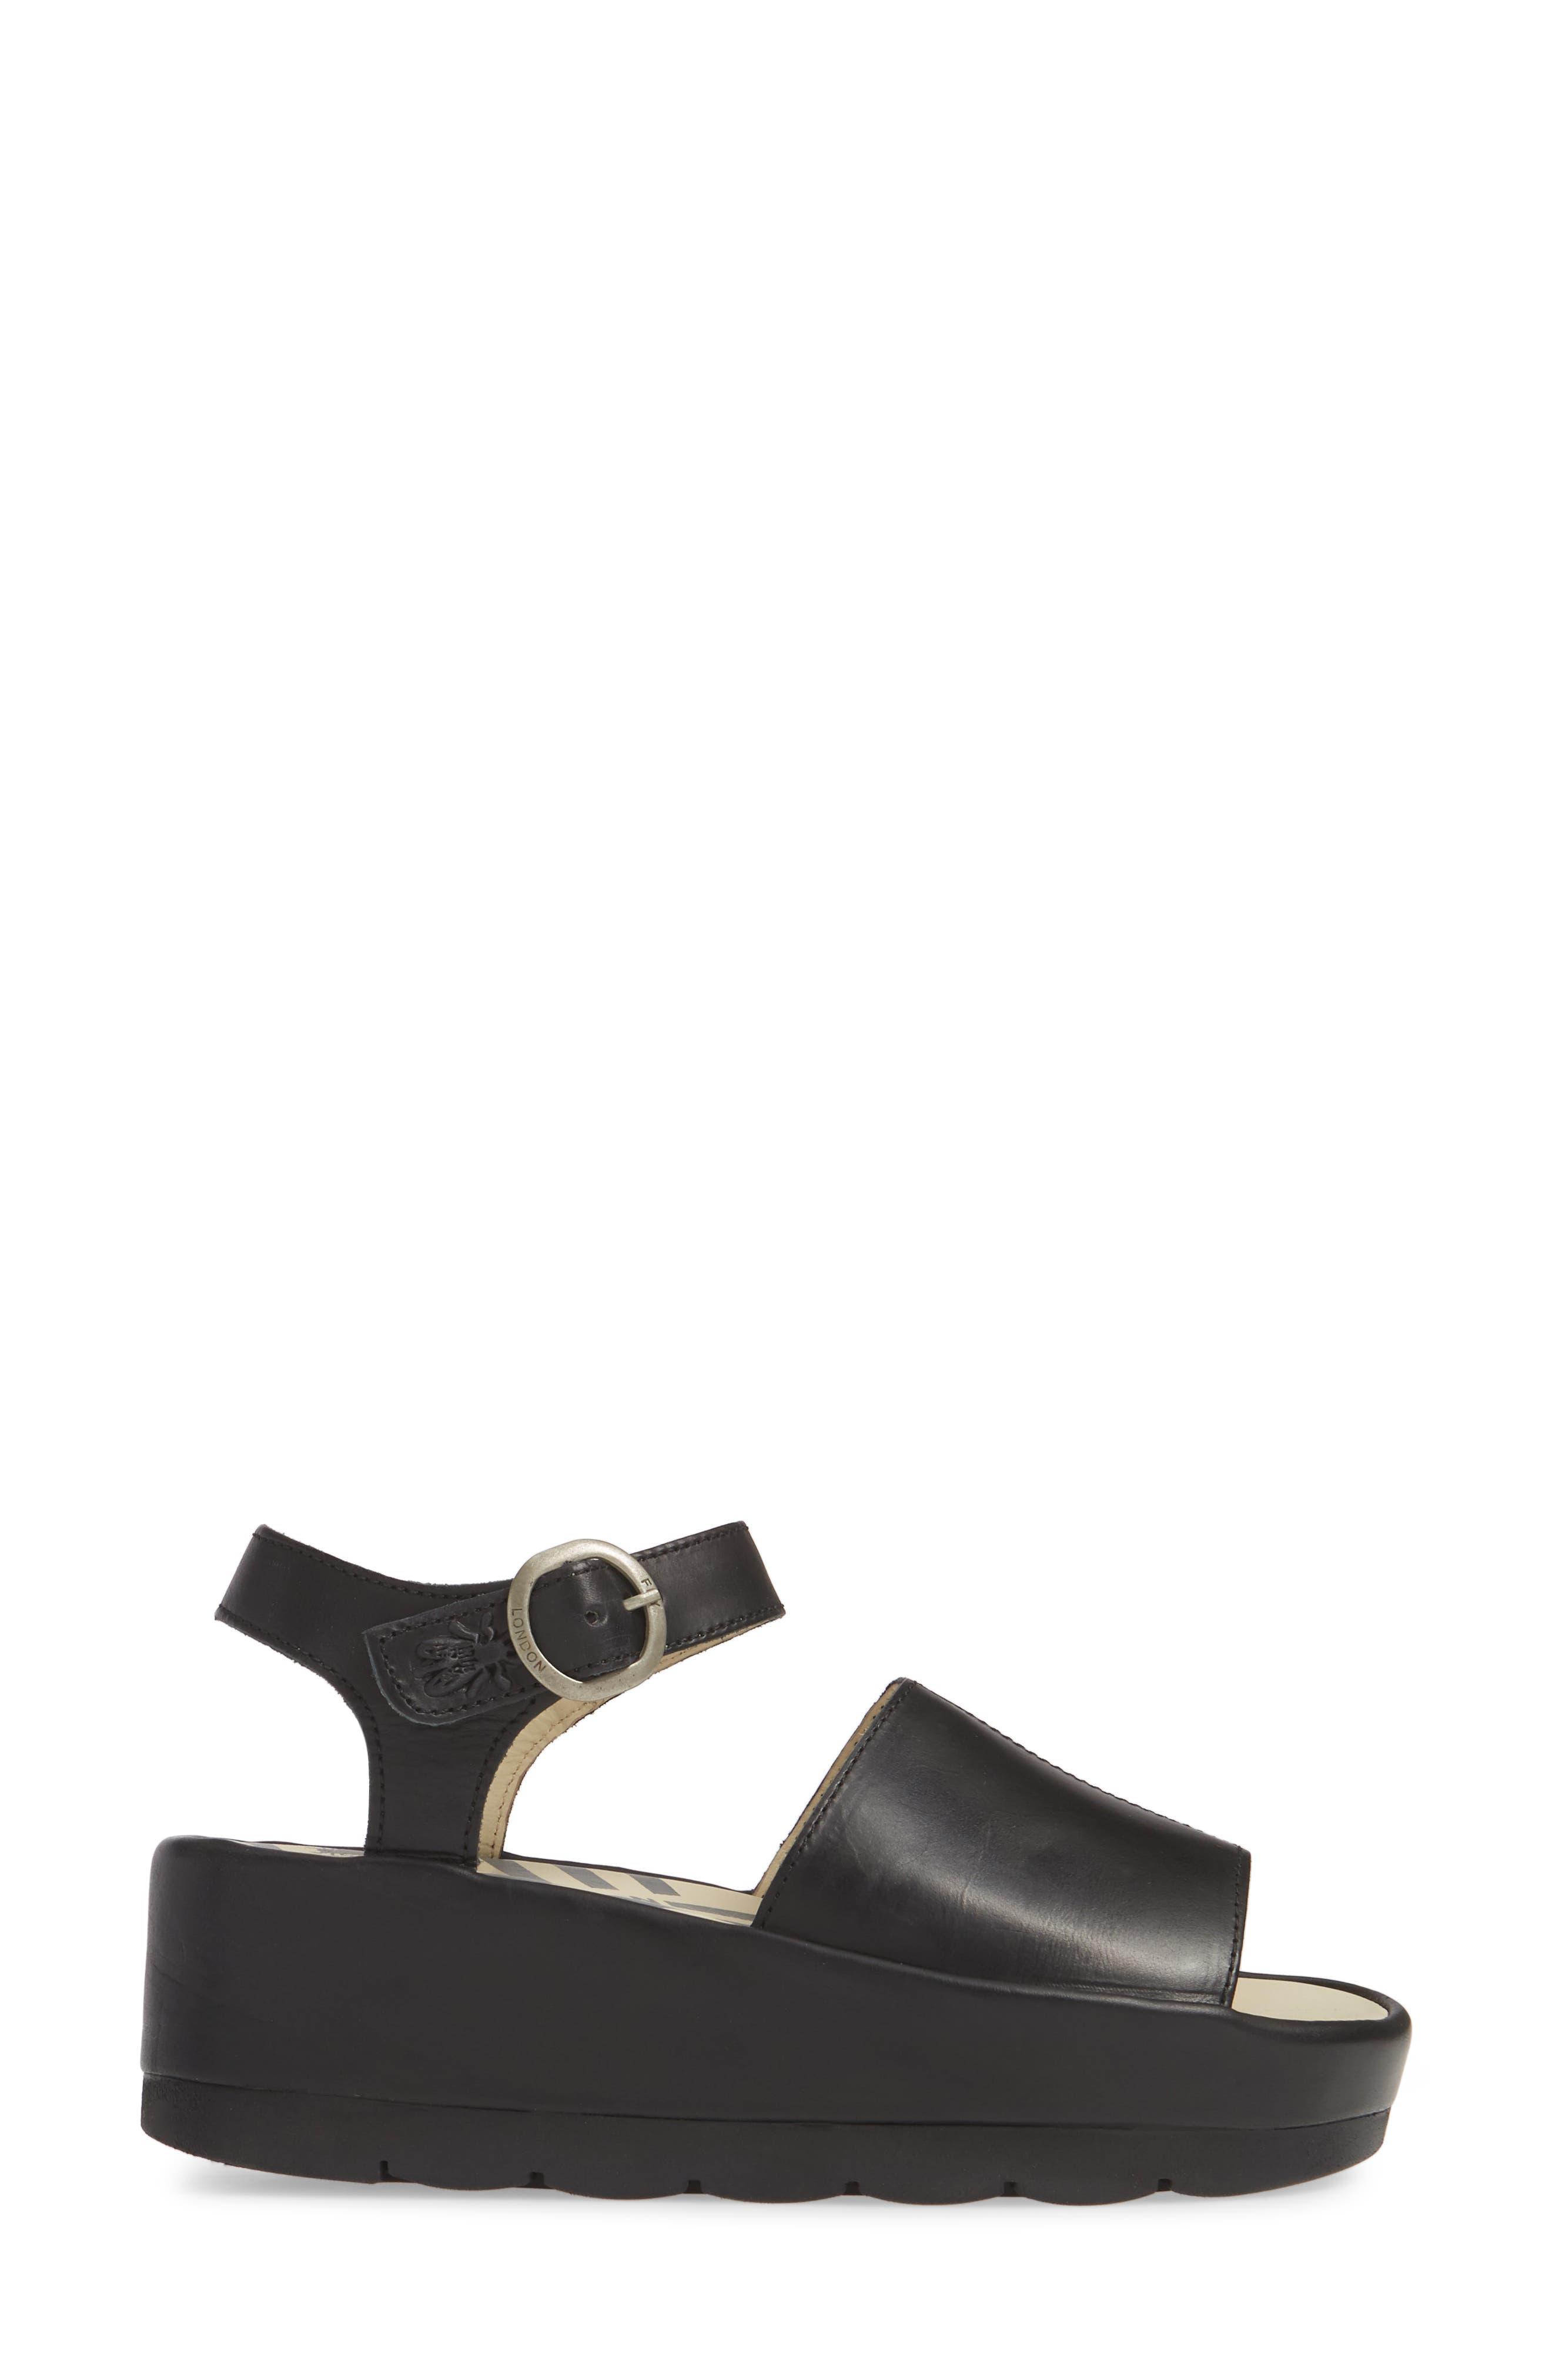 FLY LONDON, Bano Platform Sandal, Alternate thumbnail 3, color, BLACK LEATHER